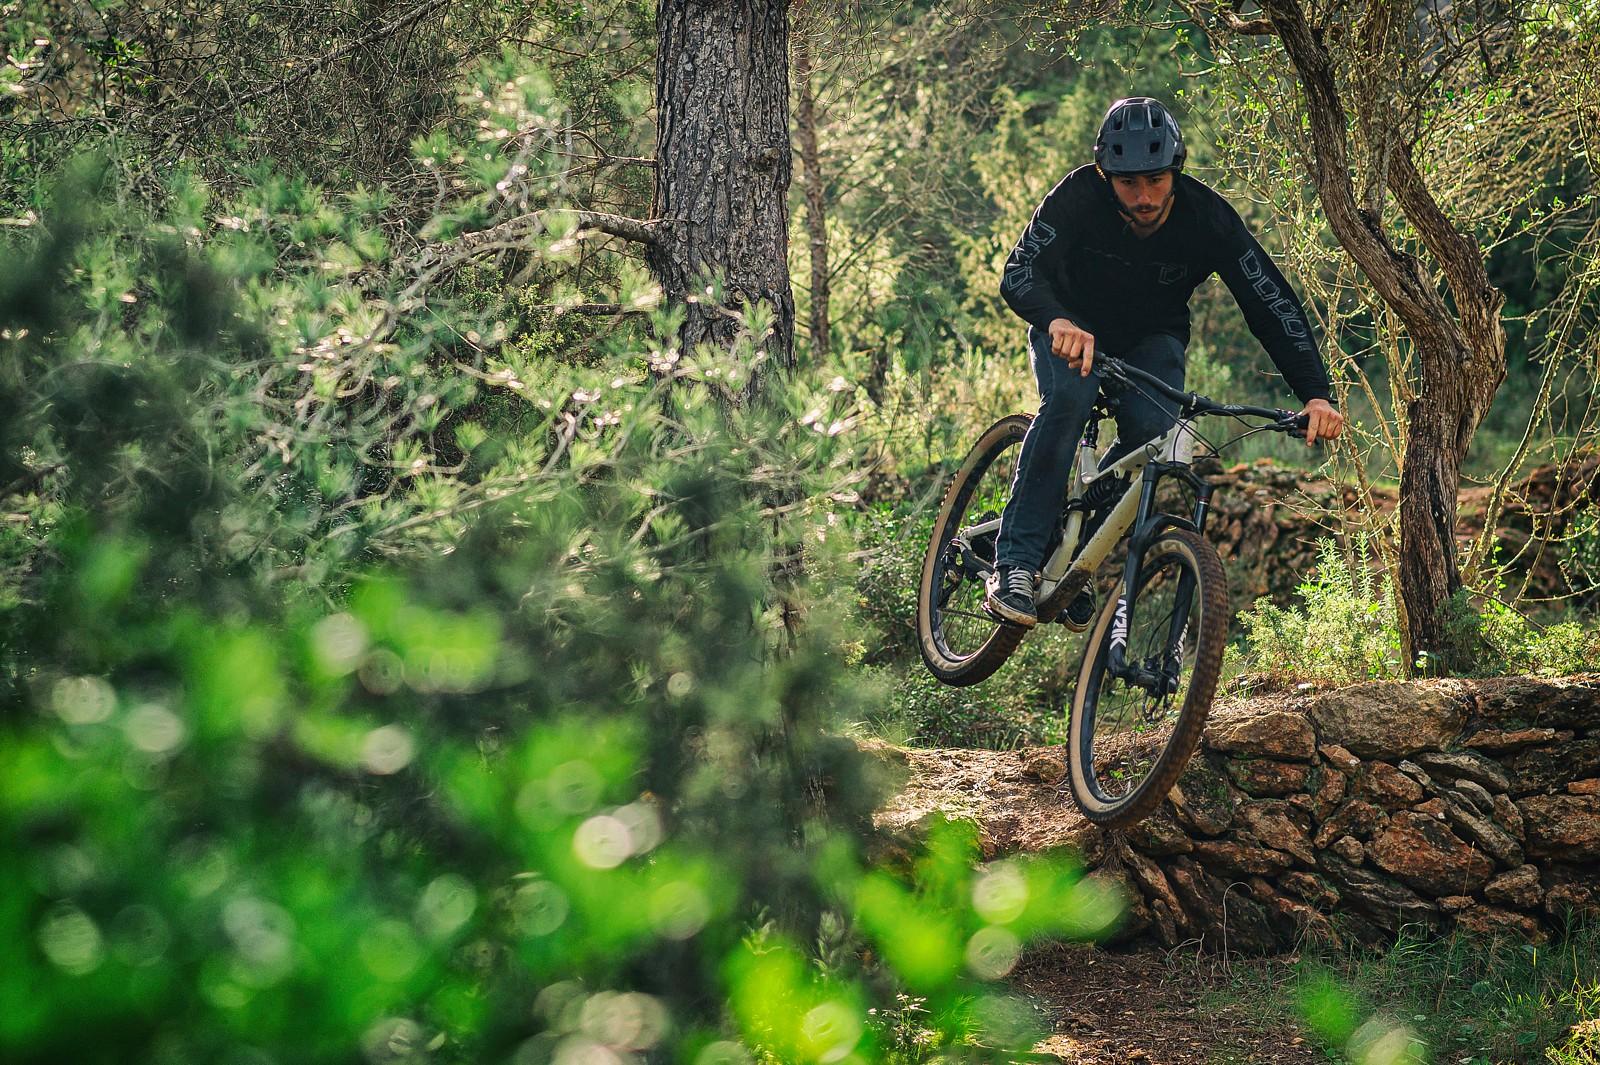 Pierrick LANNES - NicoBrizin - Mountain Biking Pictures - Vital MTB